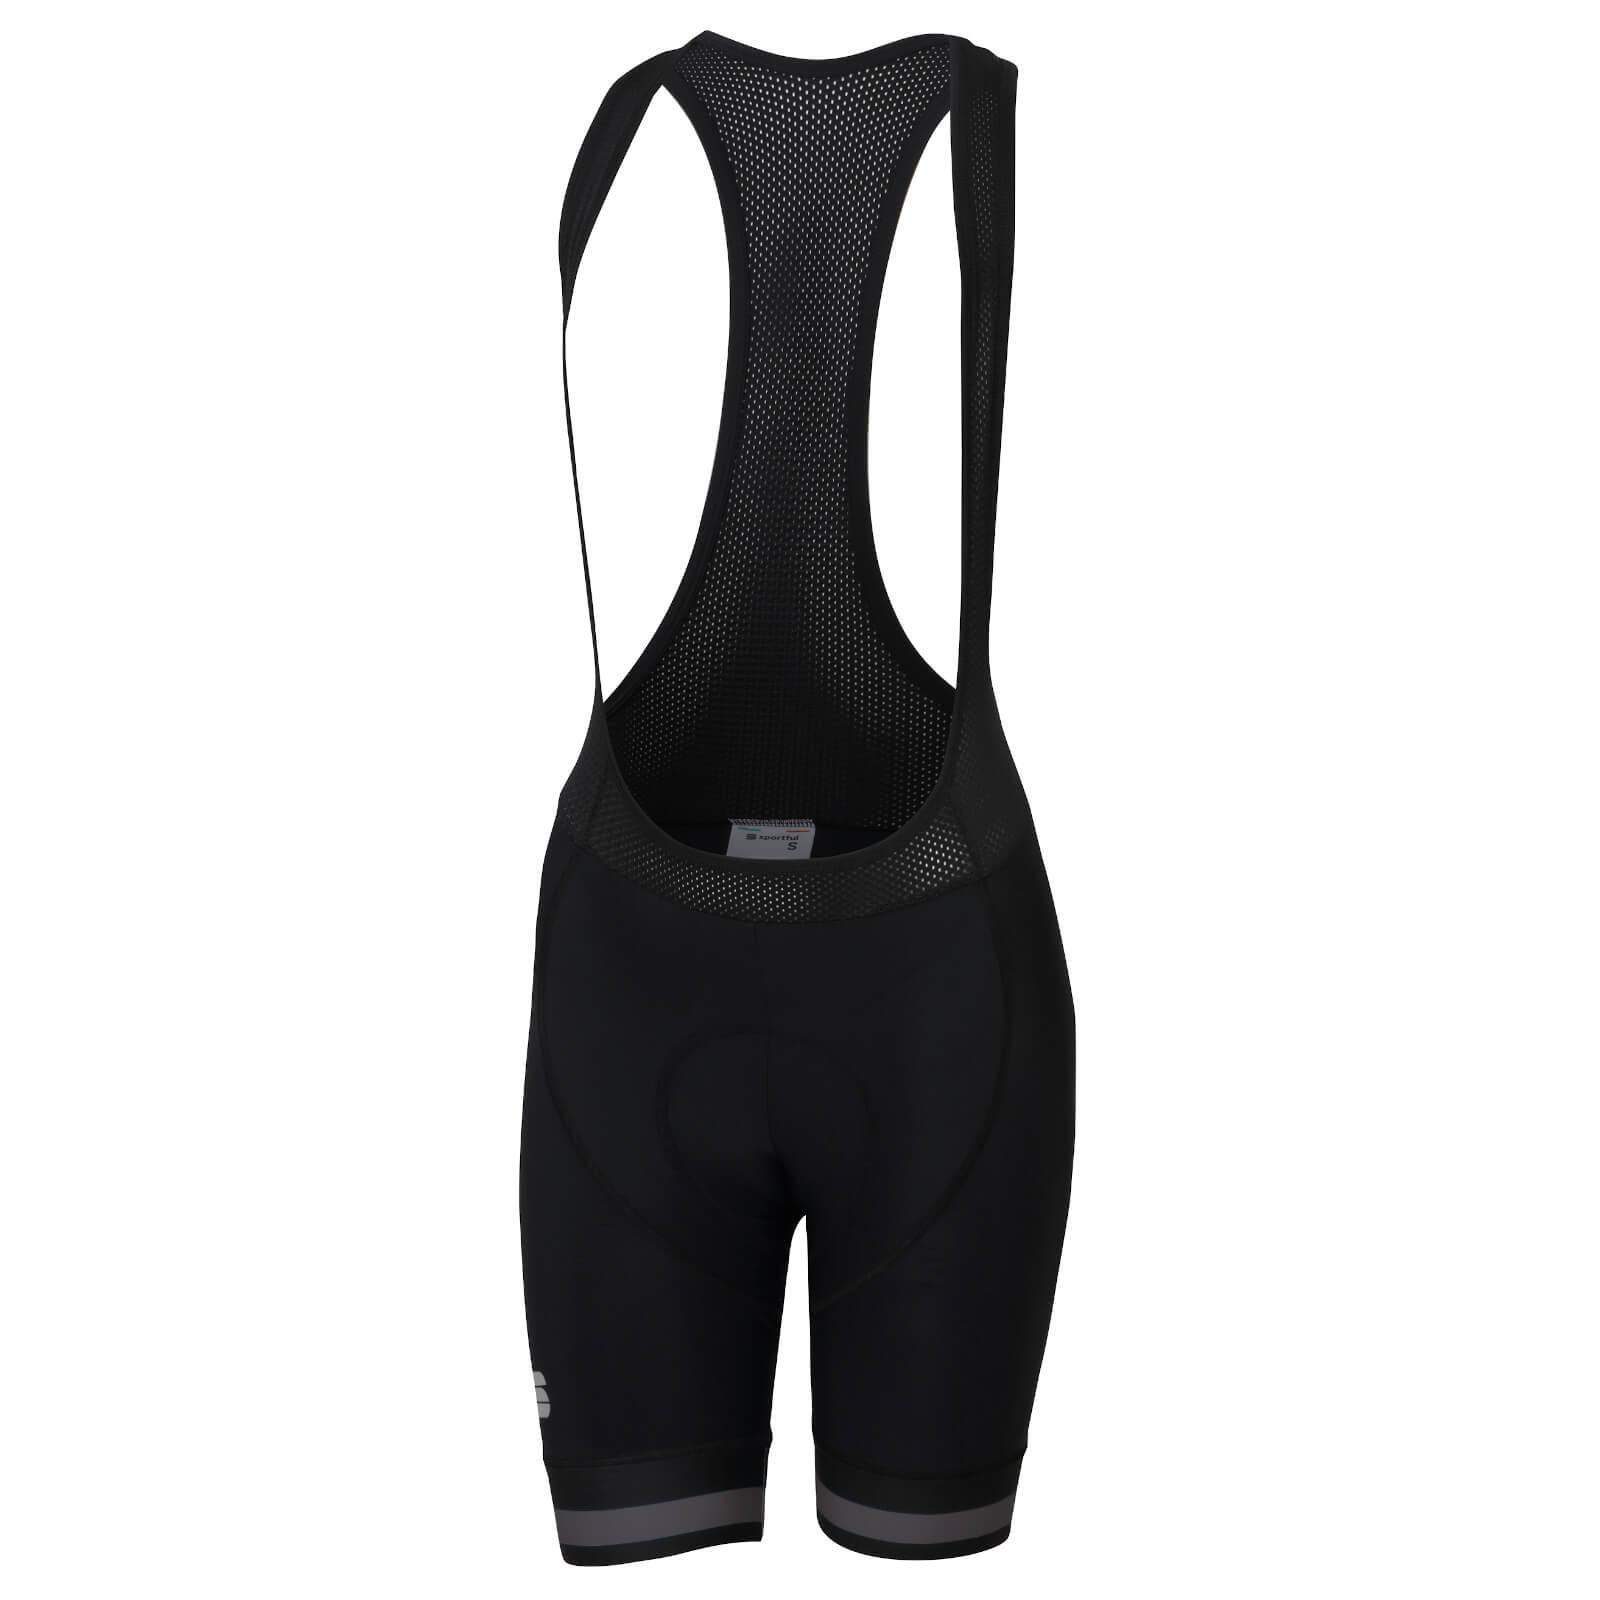 Sportful Women's BodyFit Classic Bib Shorts - S